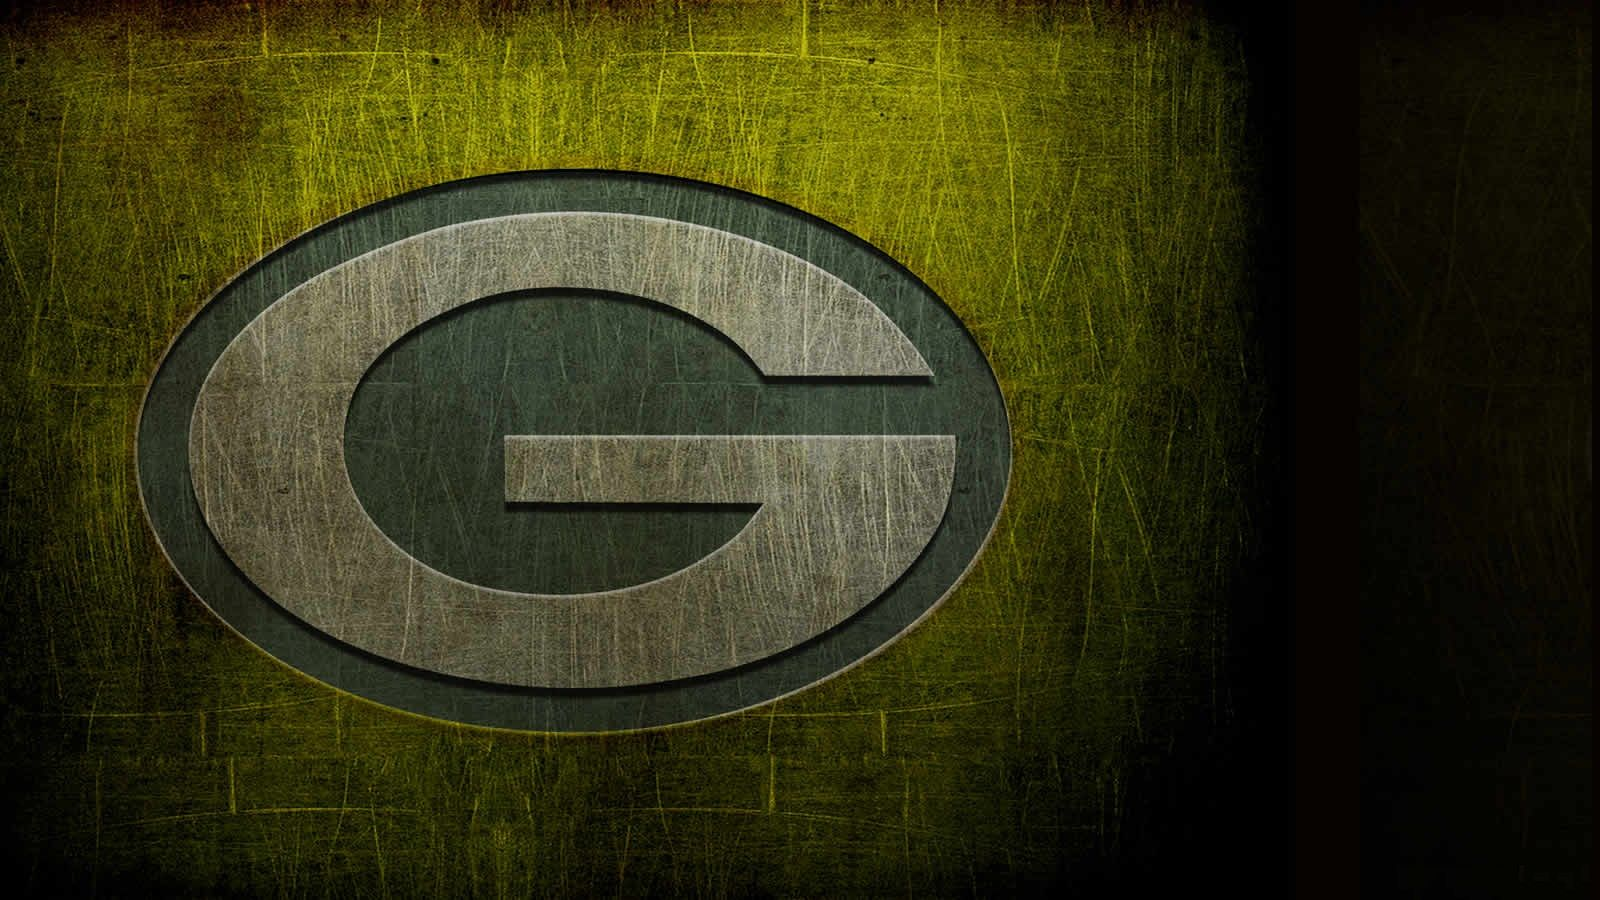 Green Bay Packers Wallpaper Border Green bay packers